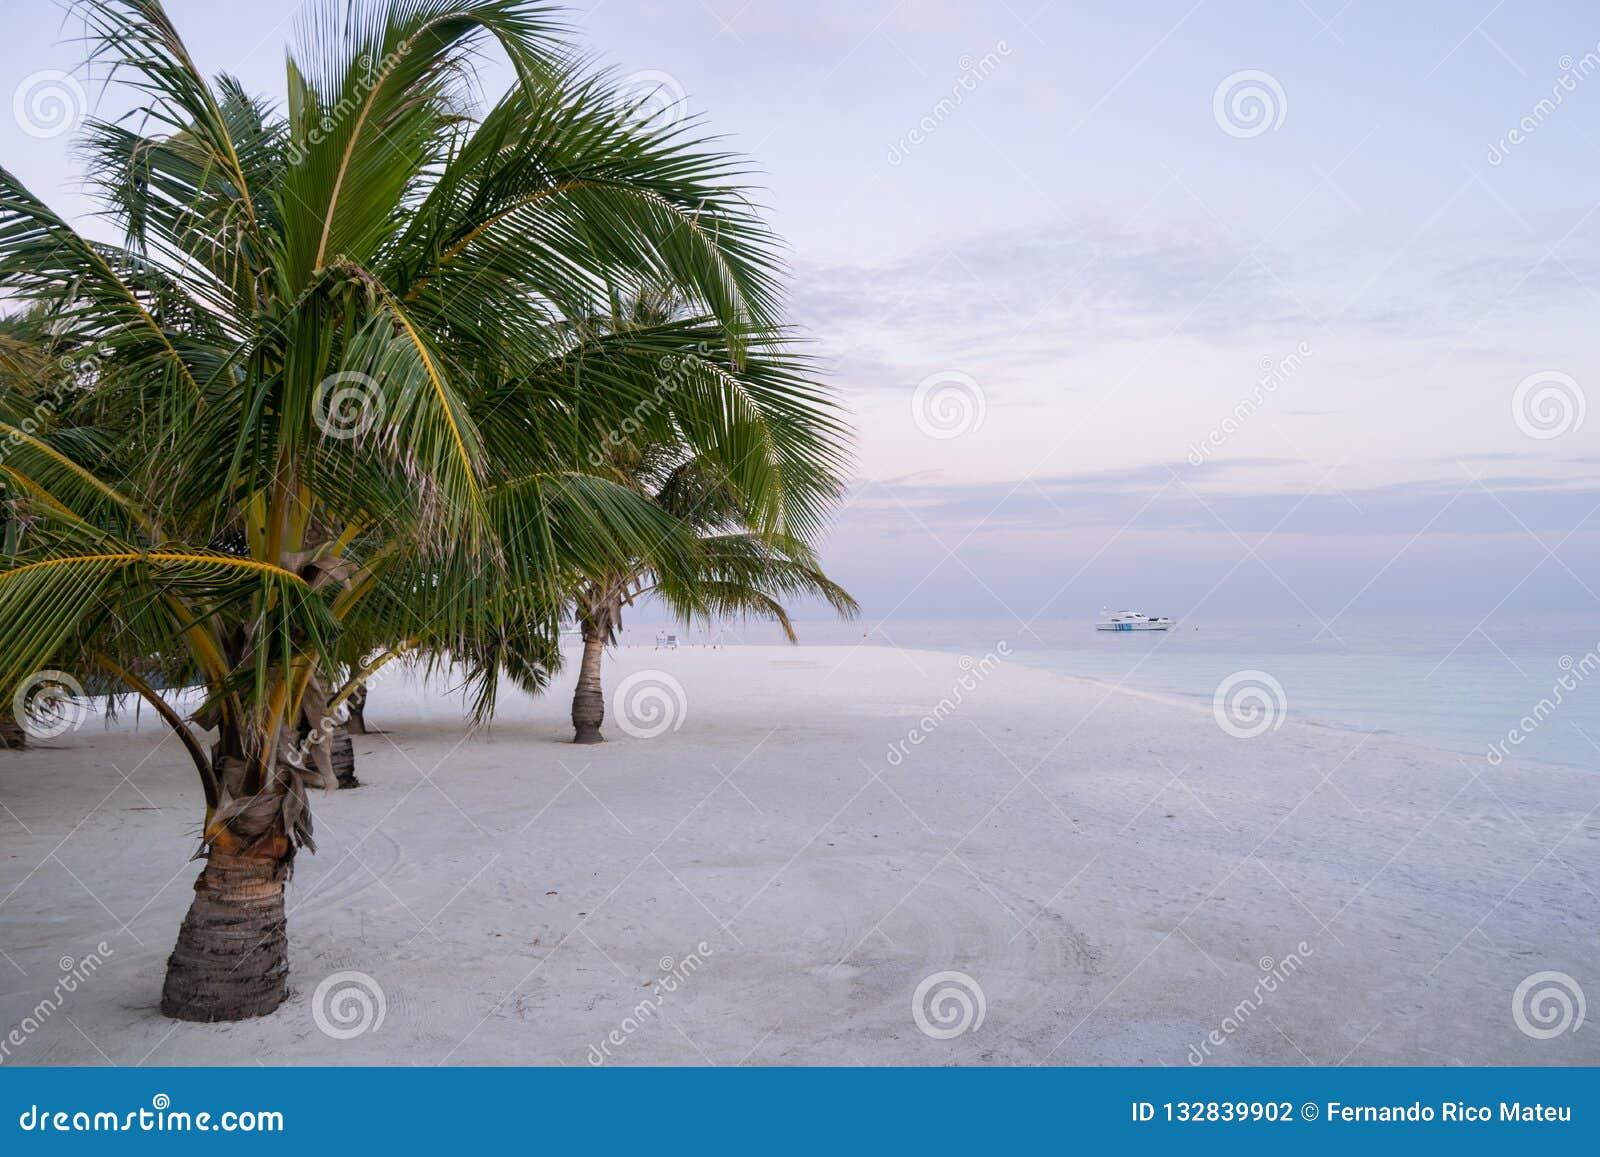 Palmeiras sobre a praia e a lancha brancas da areia sobre a lagoa de turquesa em Maldivas no por do sol